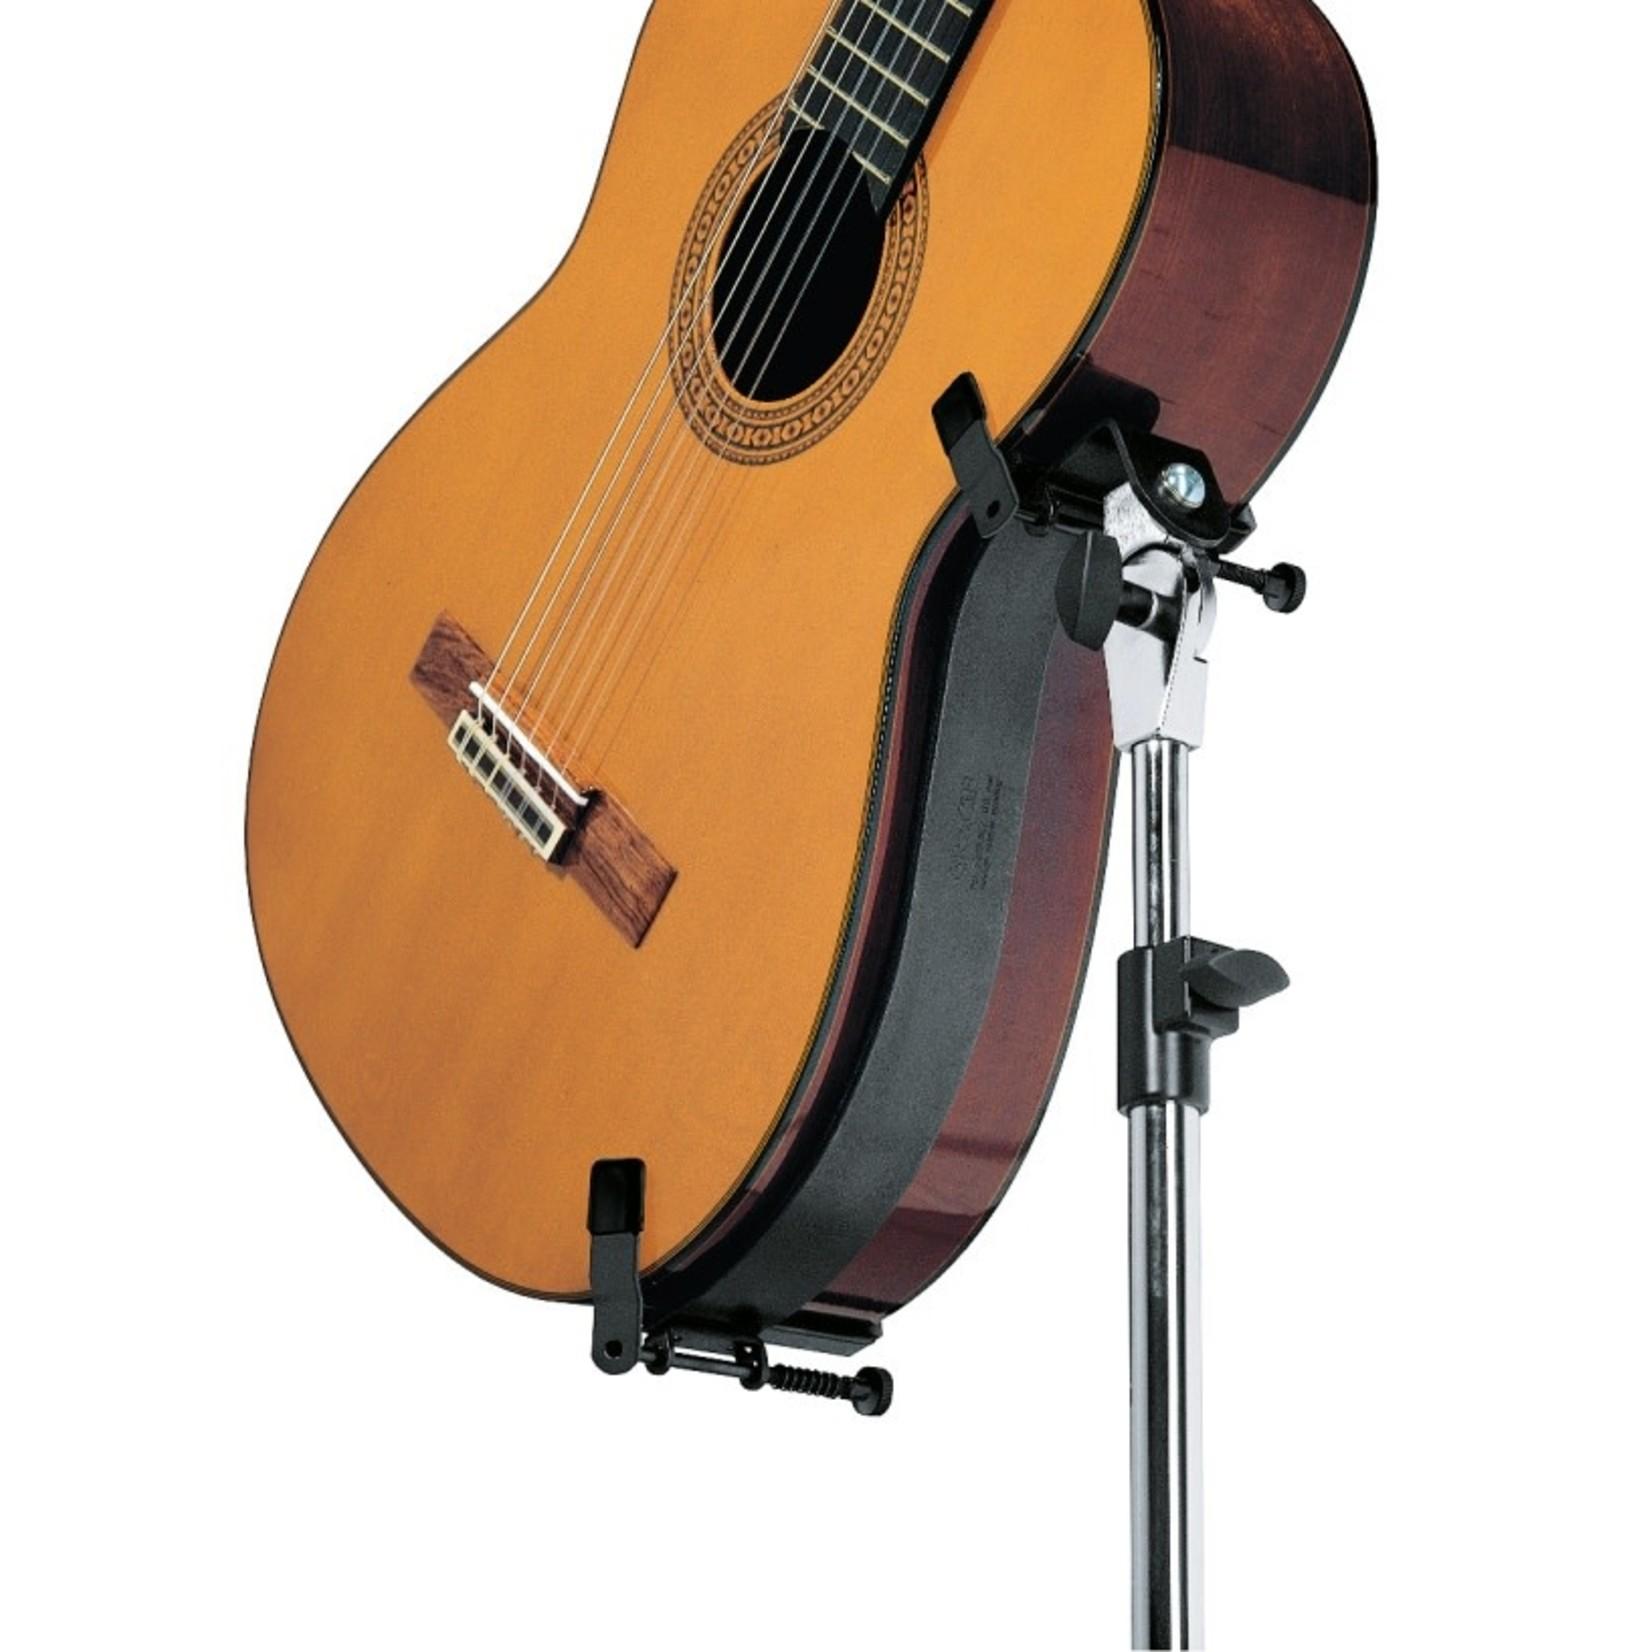 K&M Black Performer Guitar Stand for Acoustic Guitars